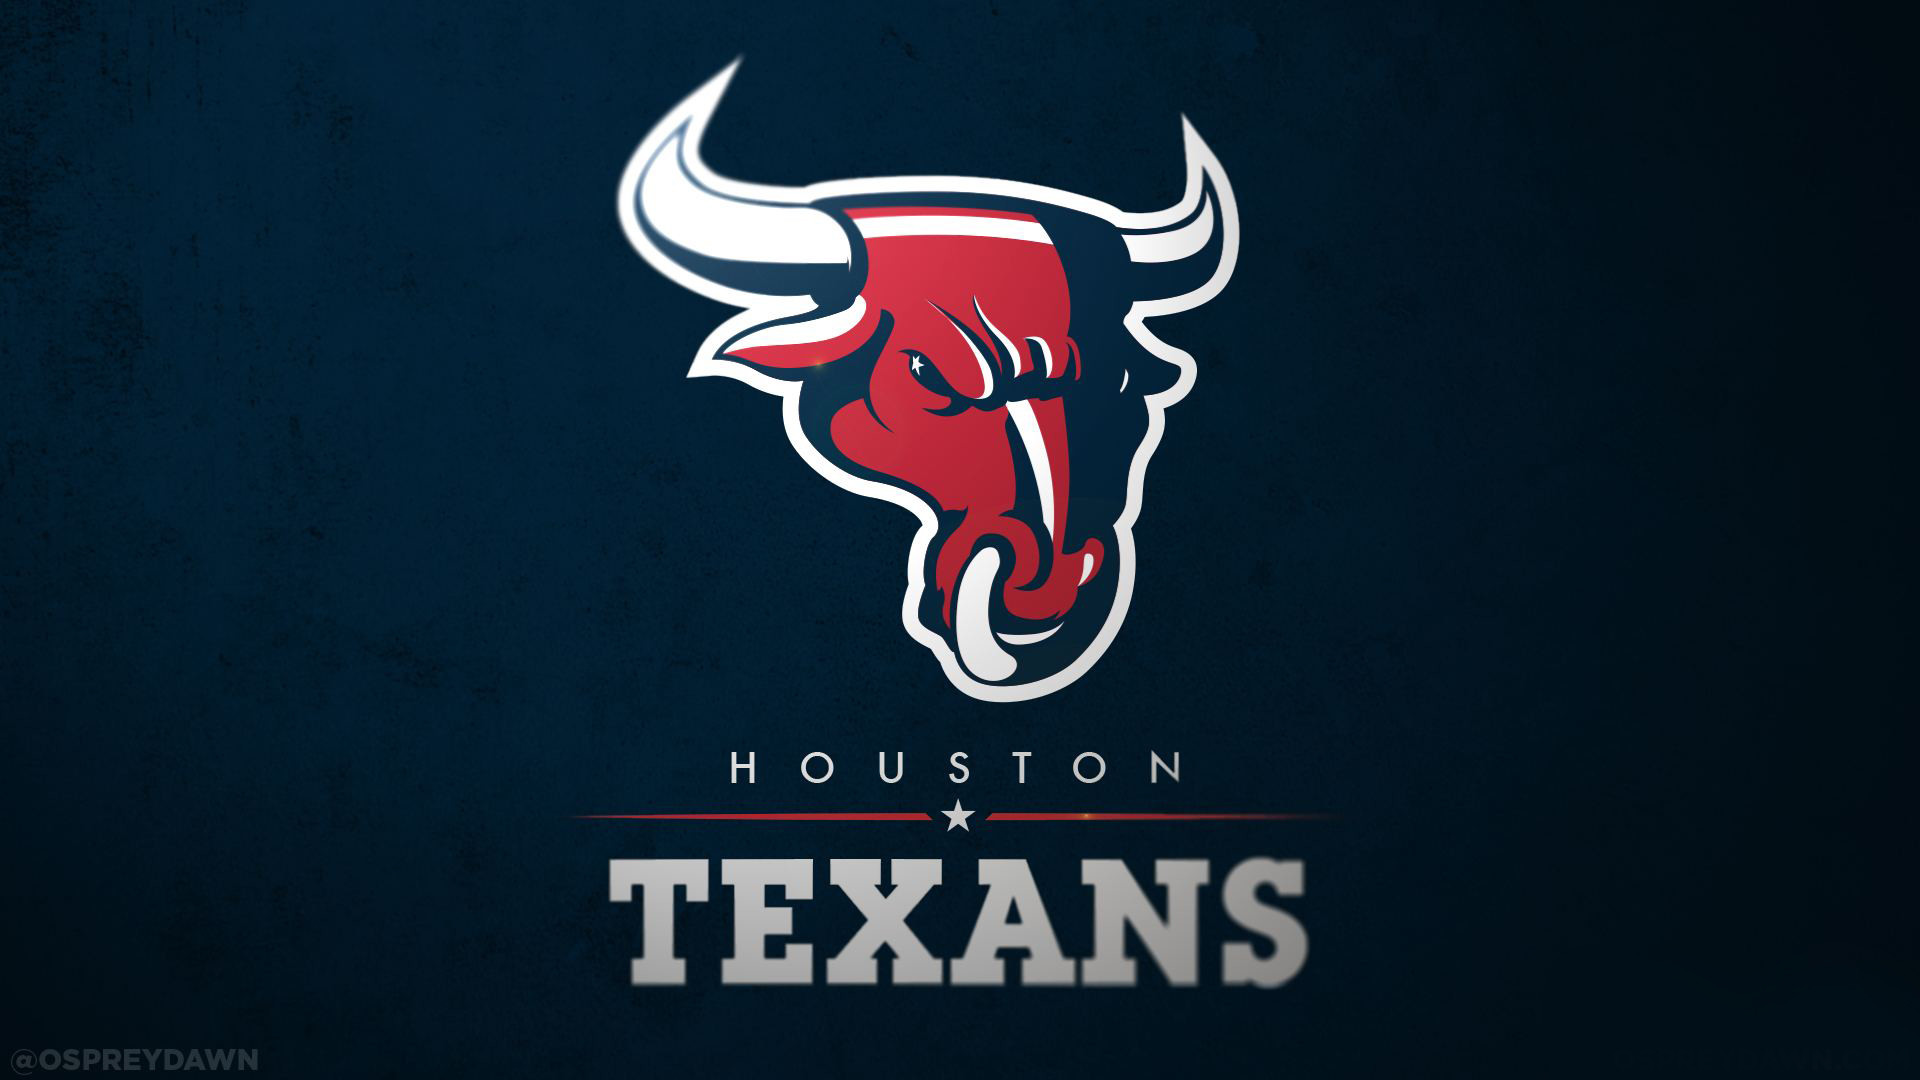 Houston Texans Wallpapers